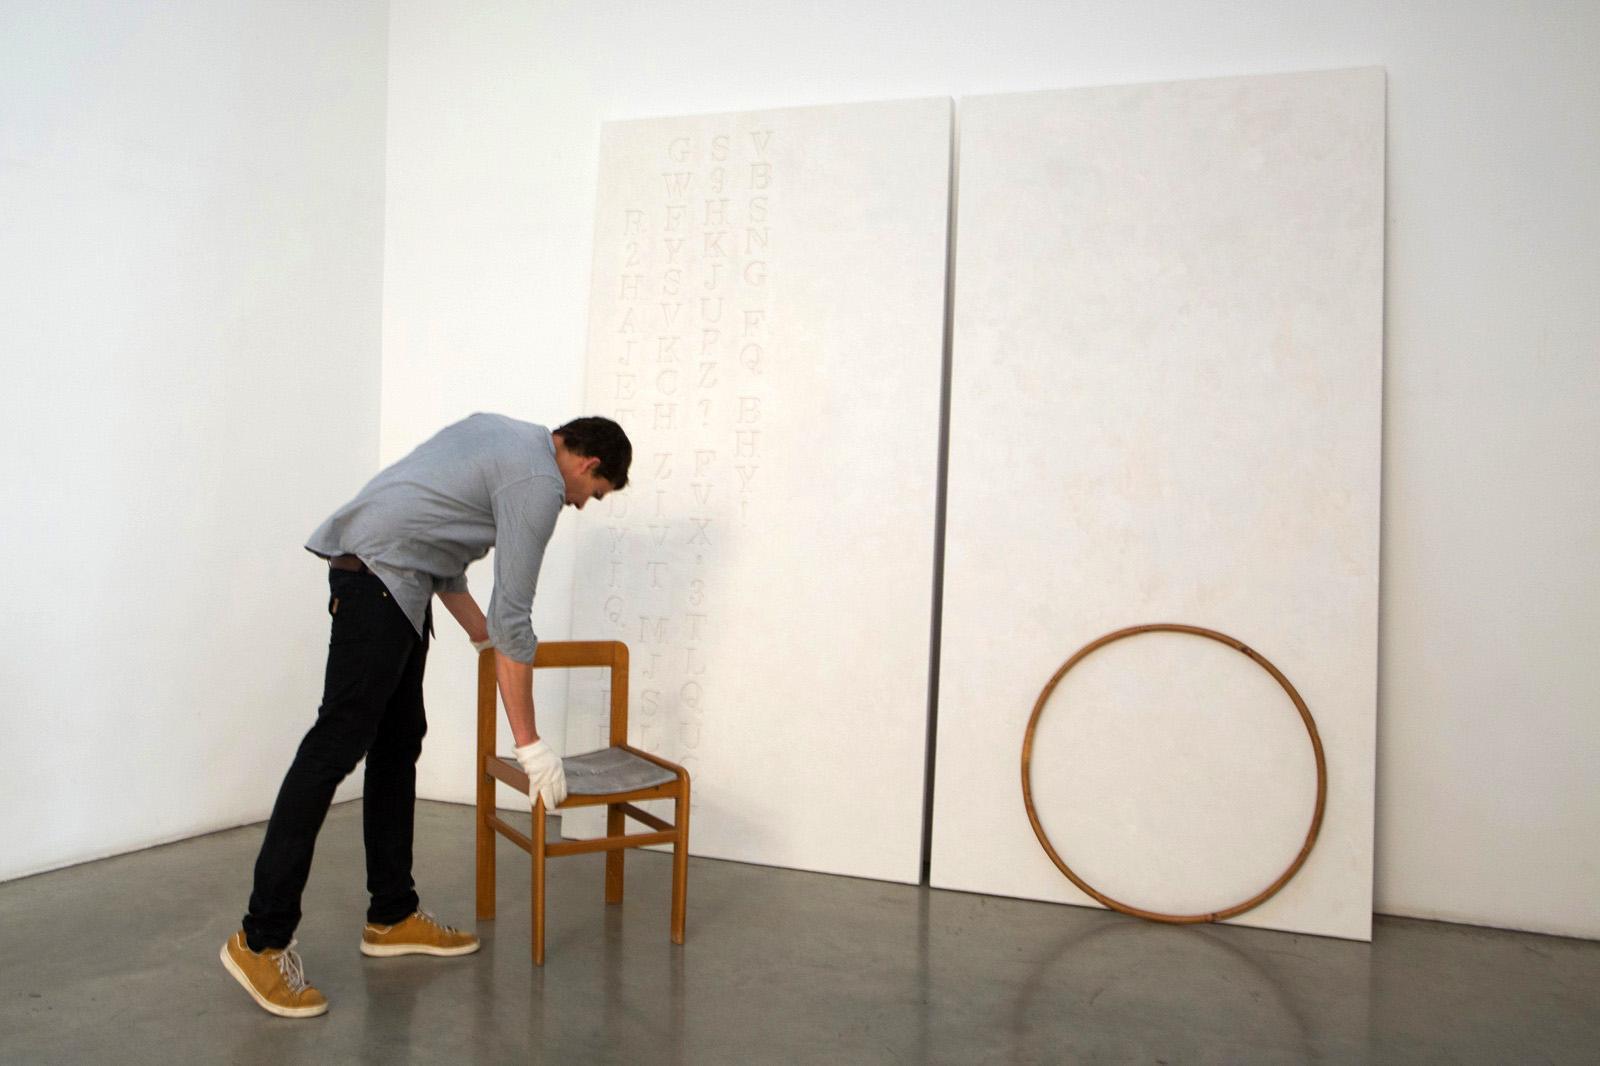 Installing HH Lim's work /Lao Tzu said/, 2016 Christine König Galerie curated byGiulia Ferracci Photo:eSeL